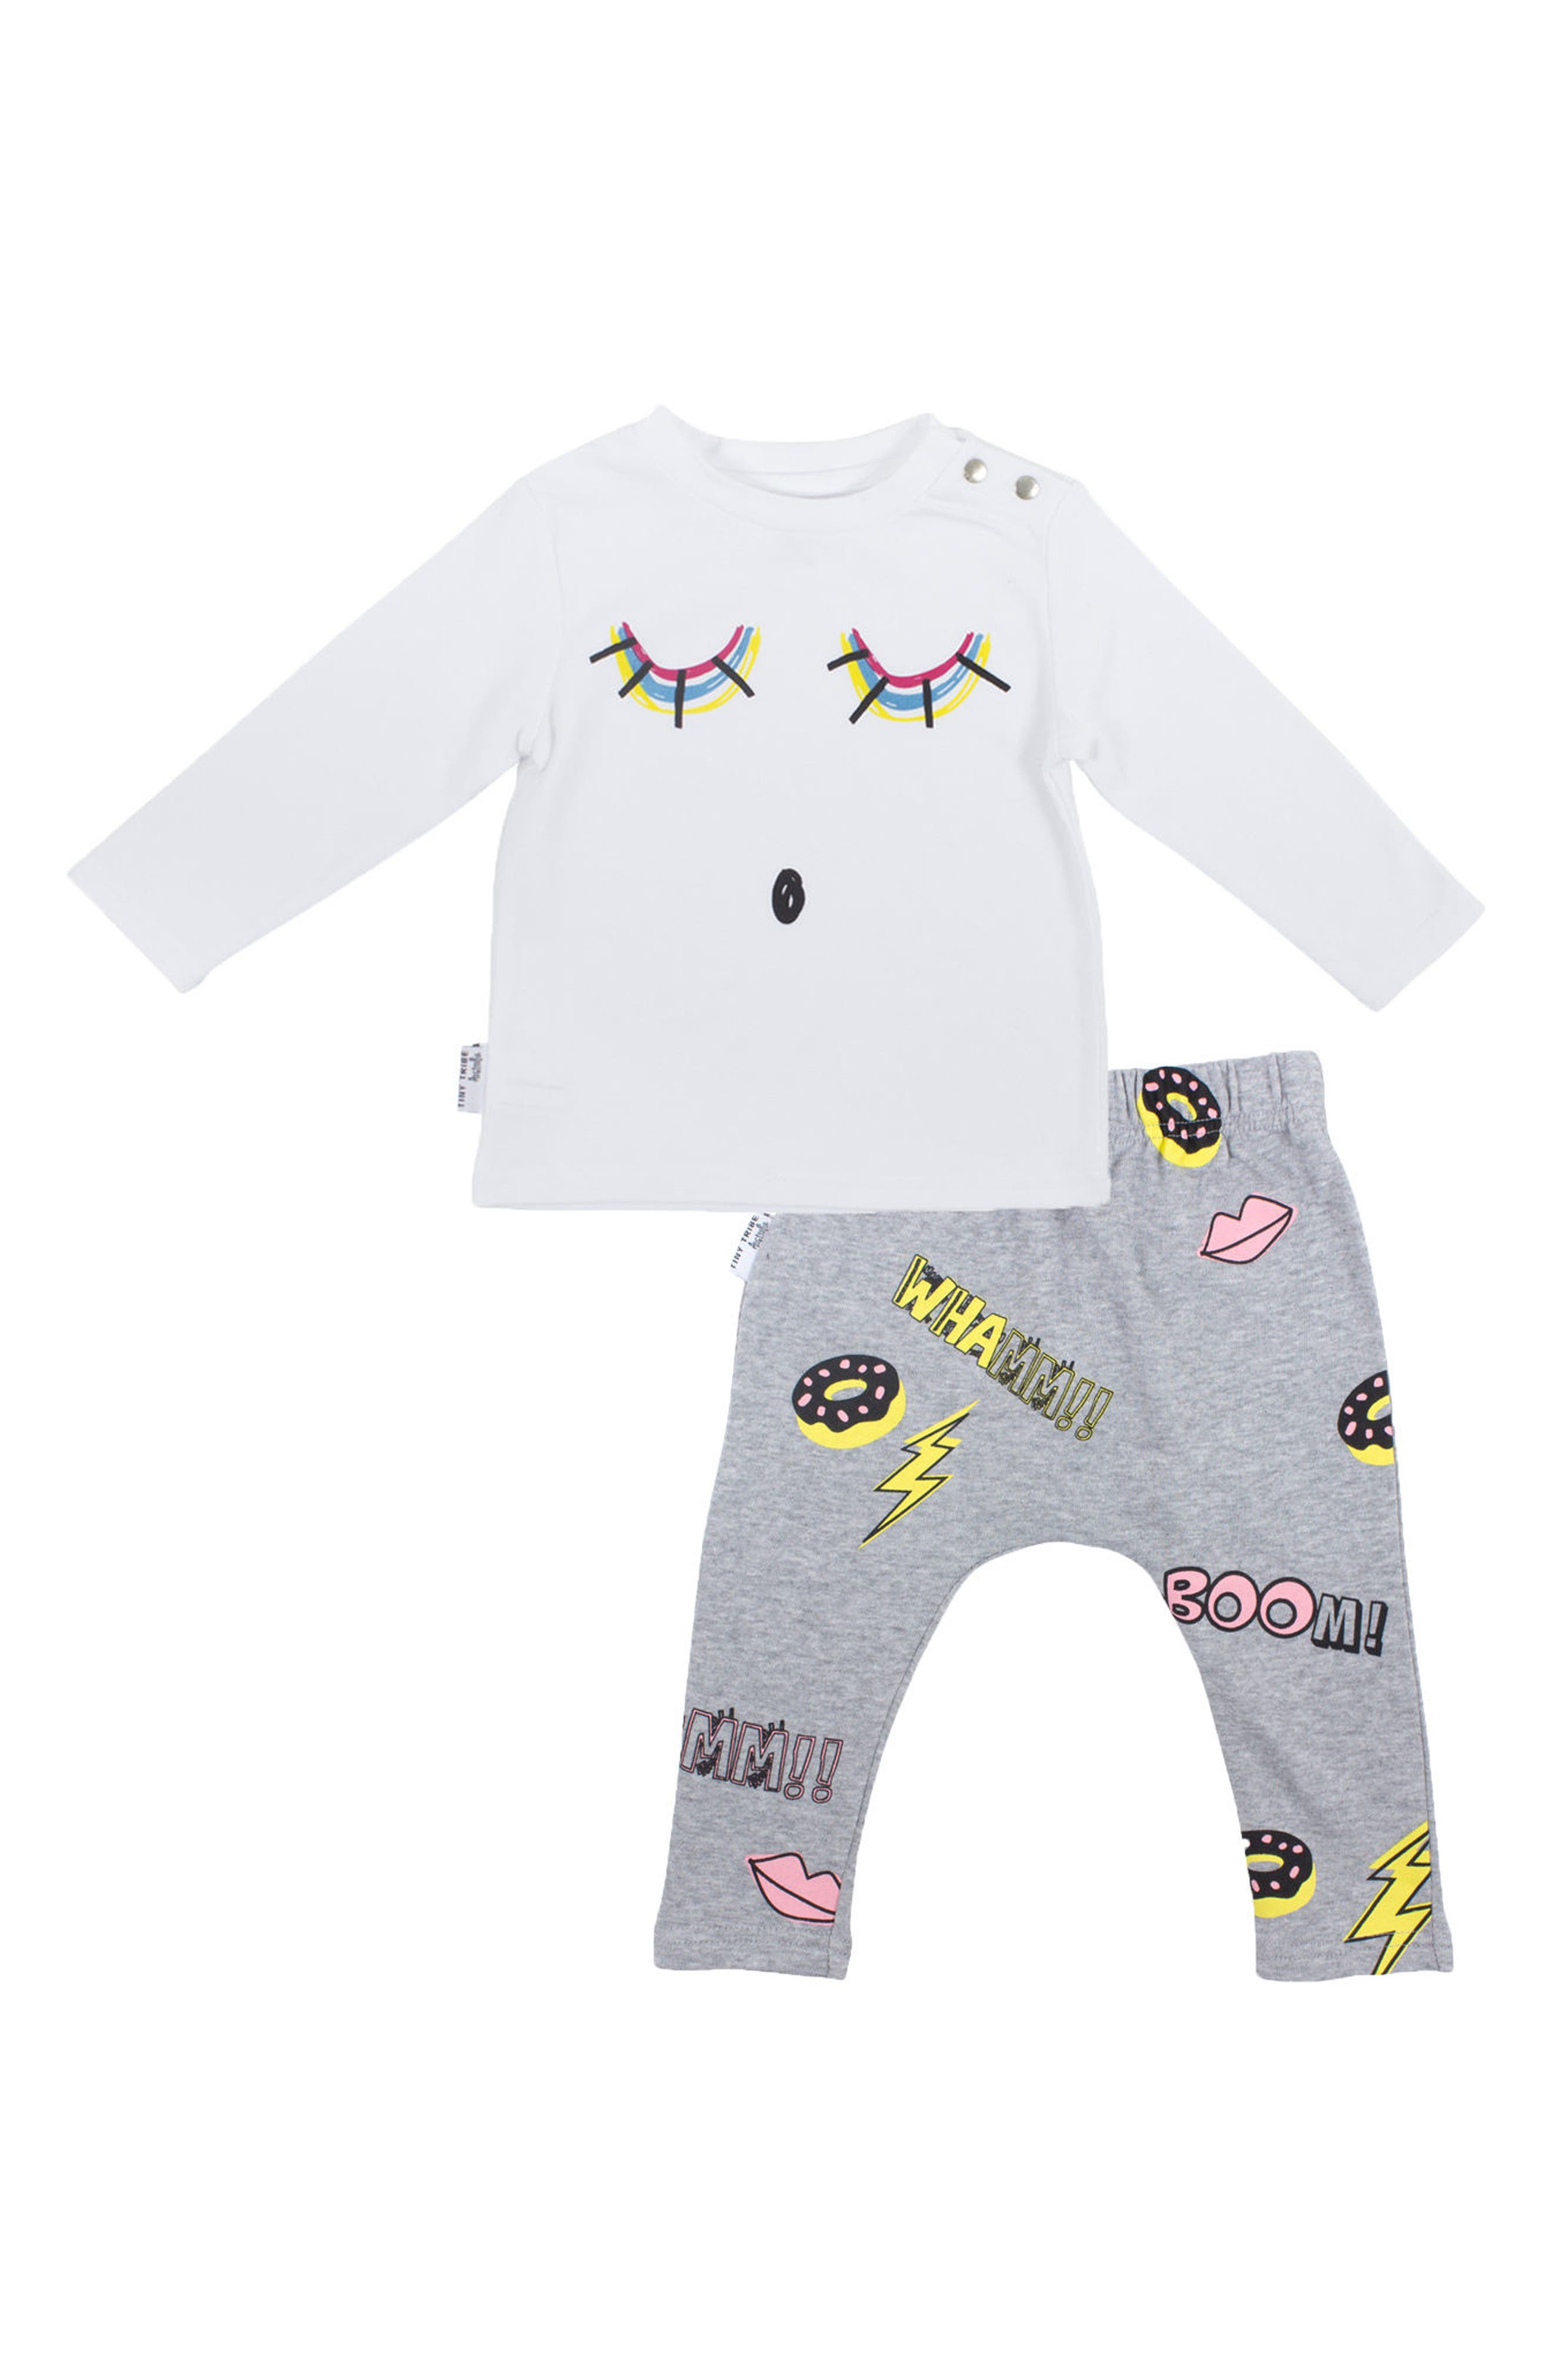 Main Image - Tiny Tribe Sleepy Kaboom Tee & Leggings Set (Baby Girls)